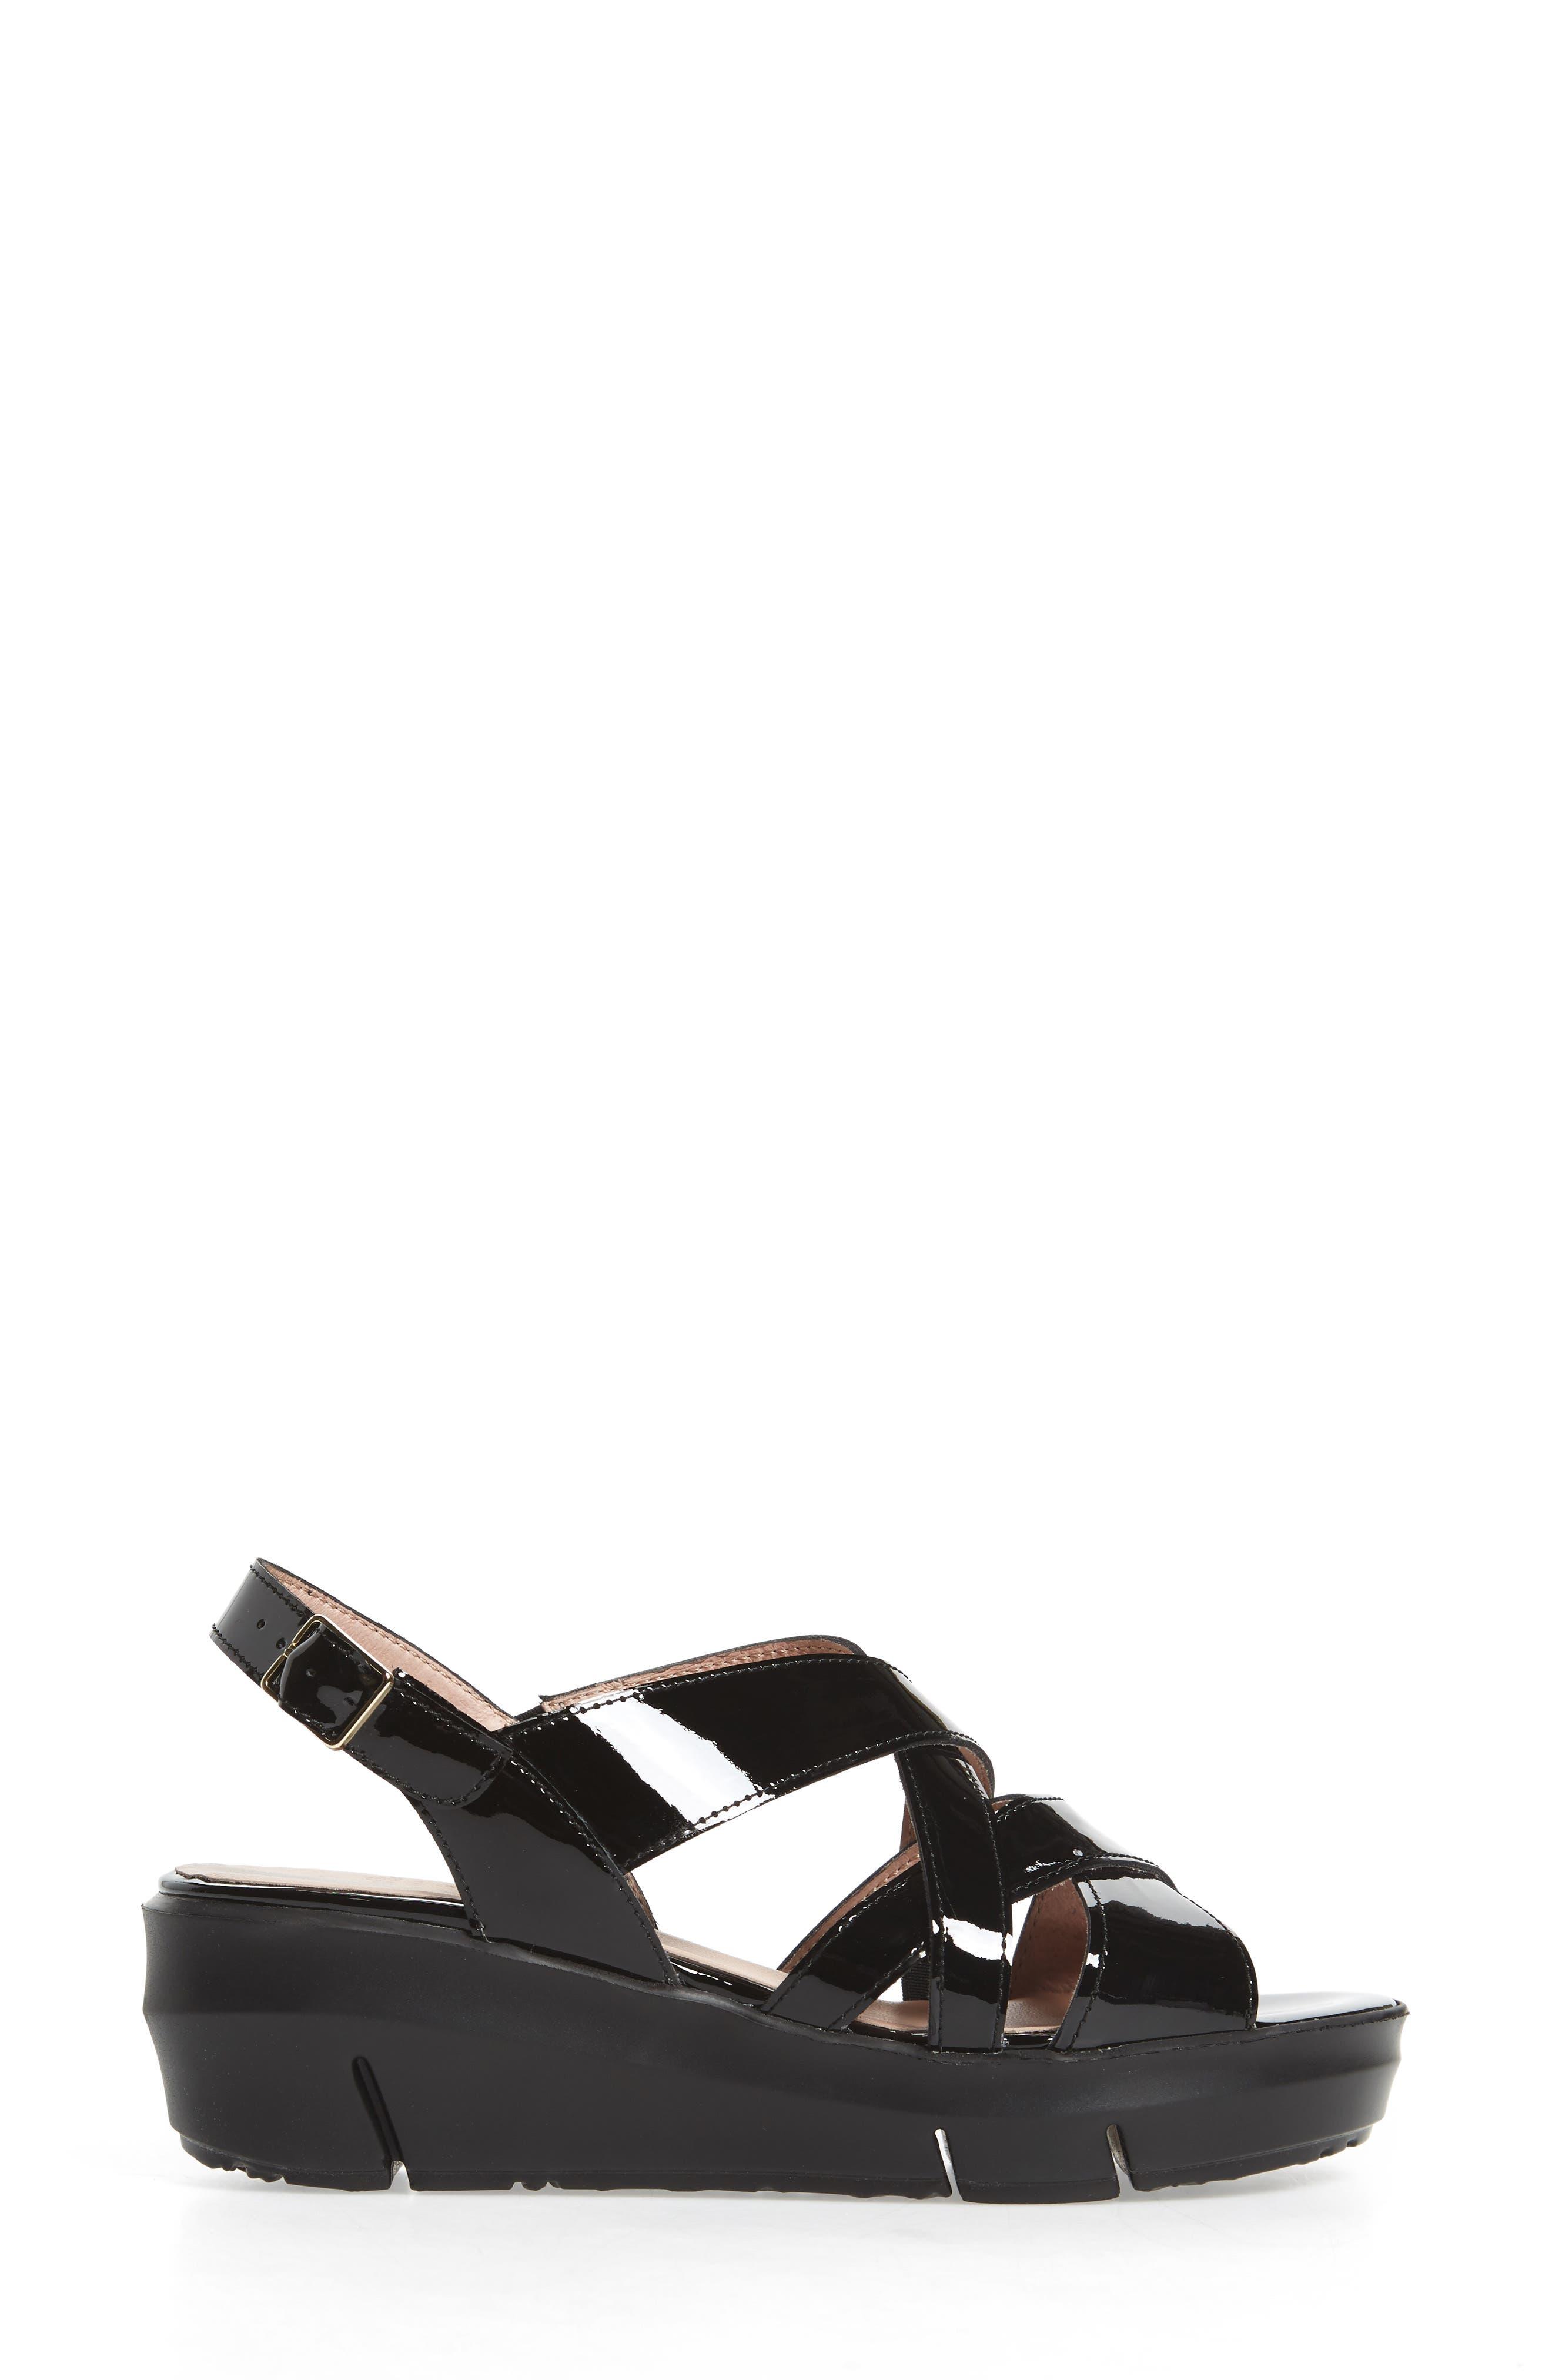 Platform Wedge Sandal,                             Alternate thumbnail 3, color,                             BLACK LEATHER